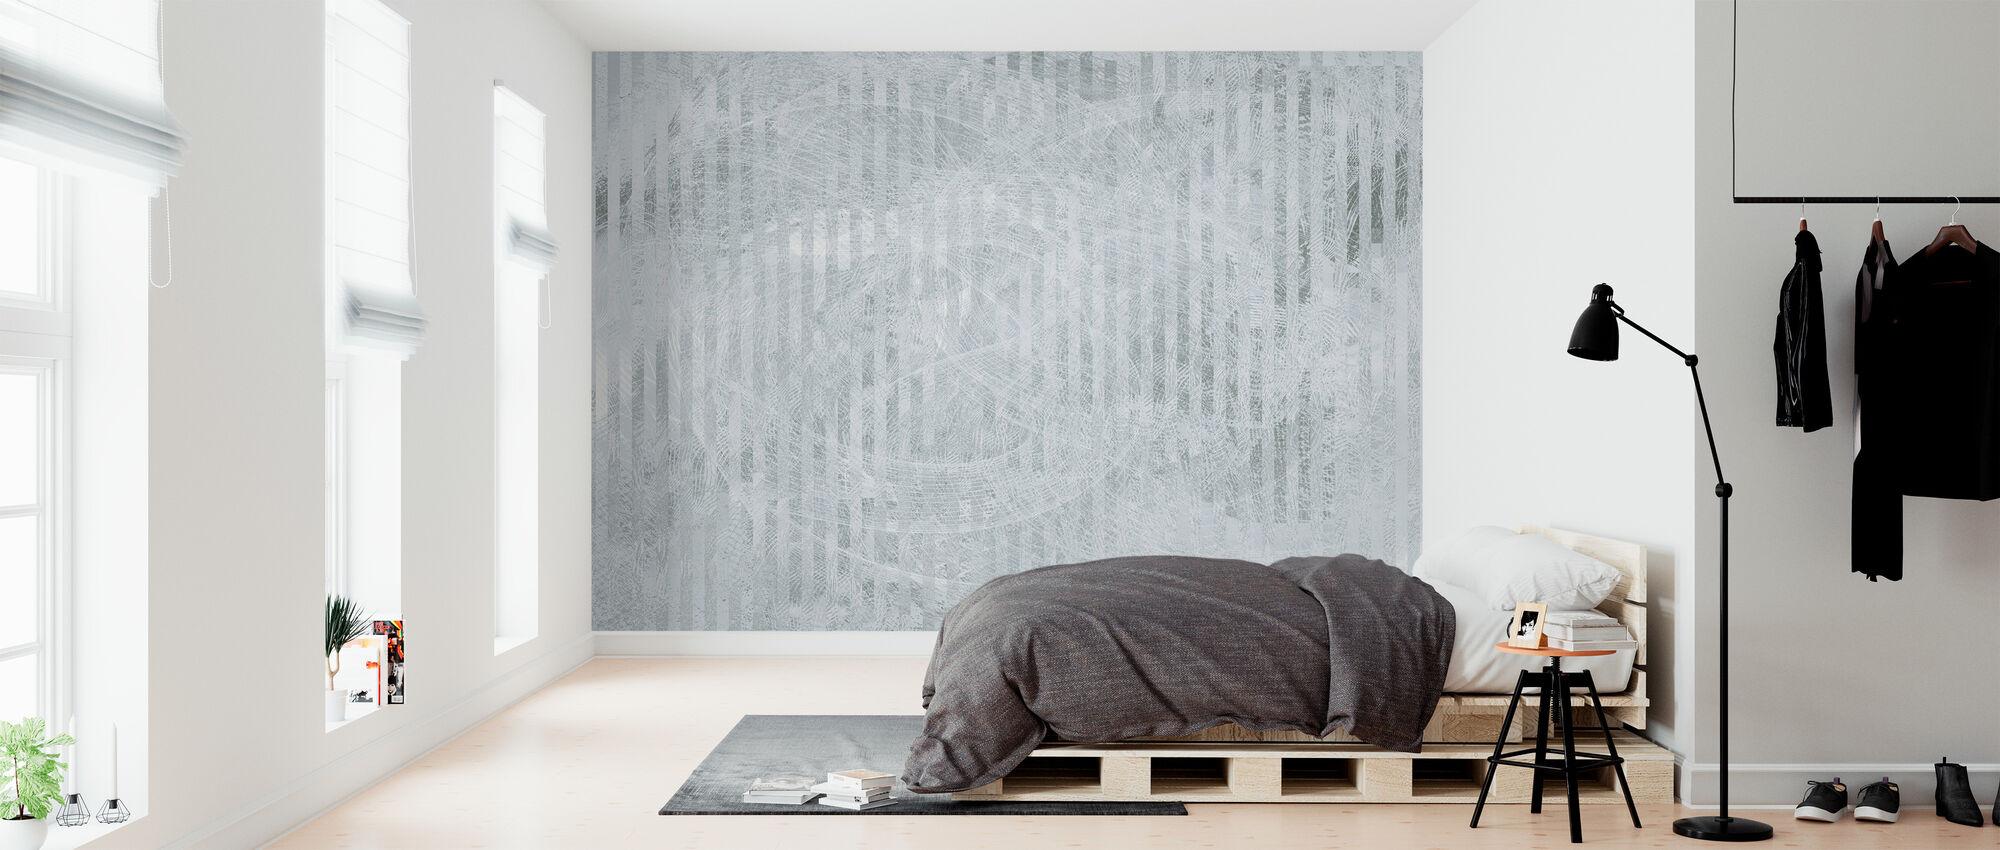 Specular Reflection - Grijs Groen - Behang - Slaapkamer